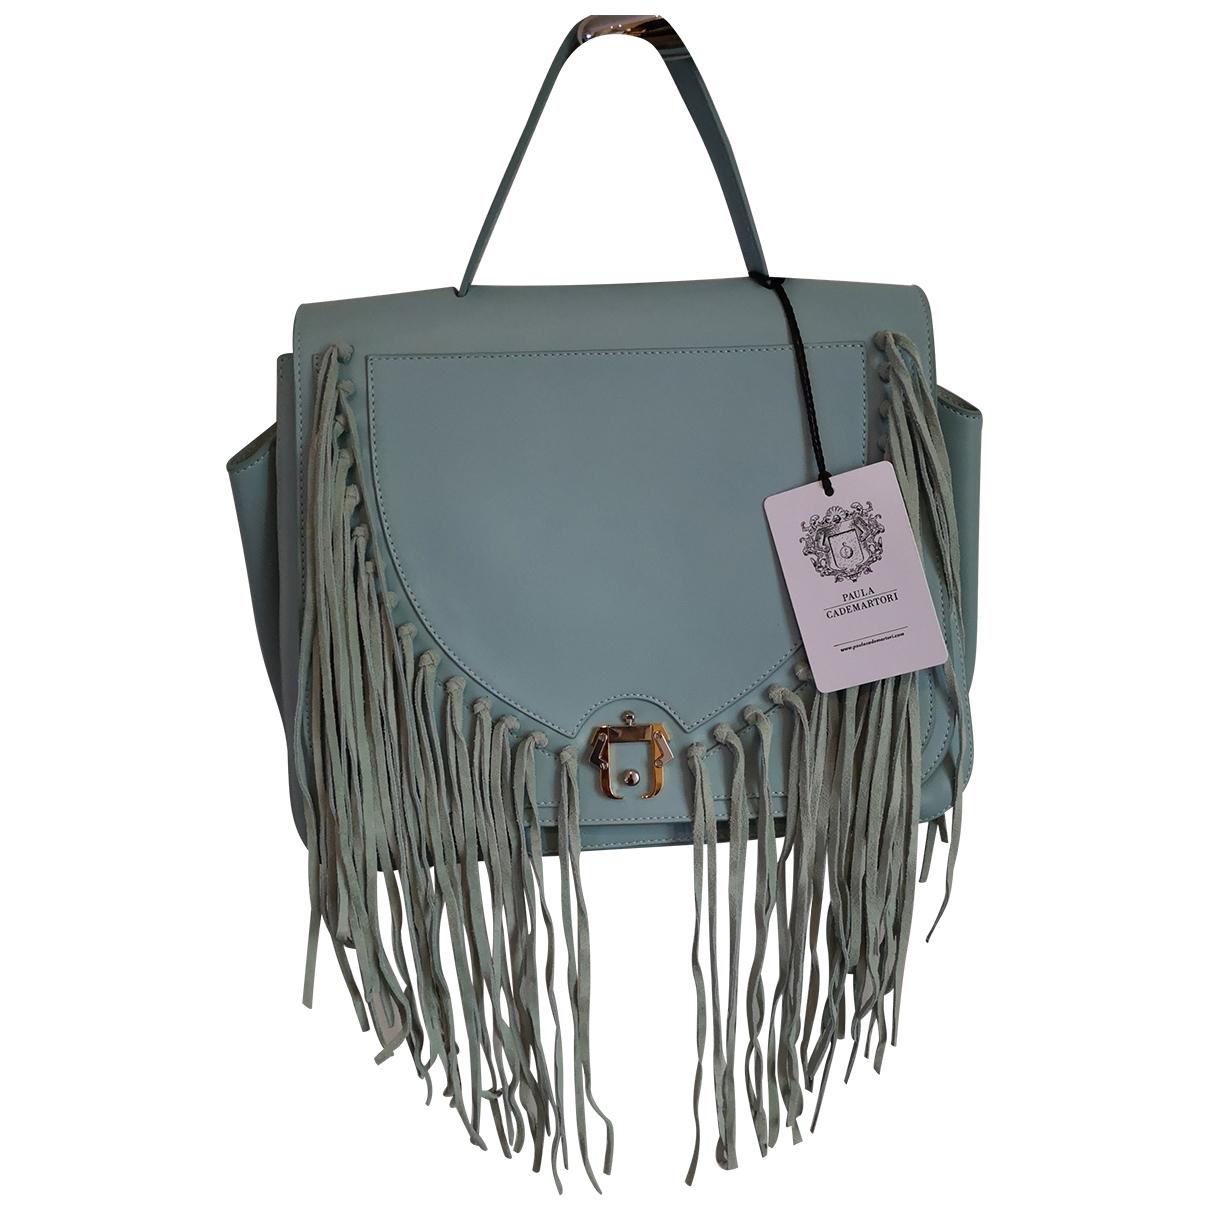 Paula Cademartori \N Blue Leather handbag for Women \N